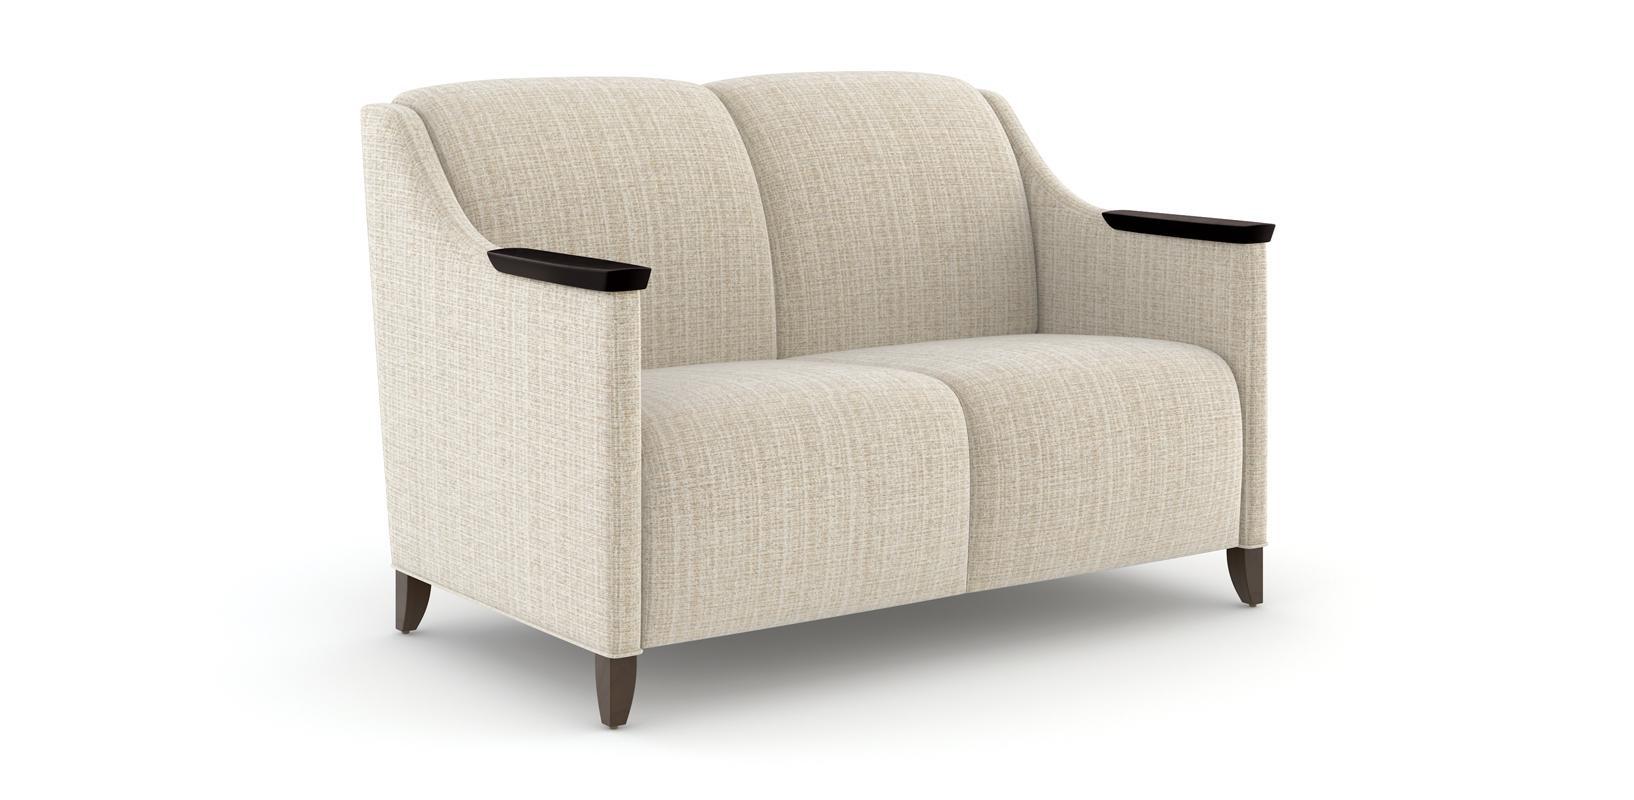 Facelift1 Prime Low Leg Lounge Seating Trinity Furniture